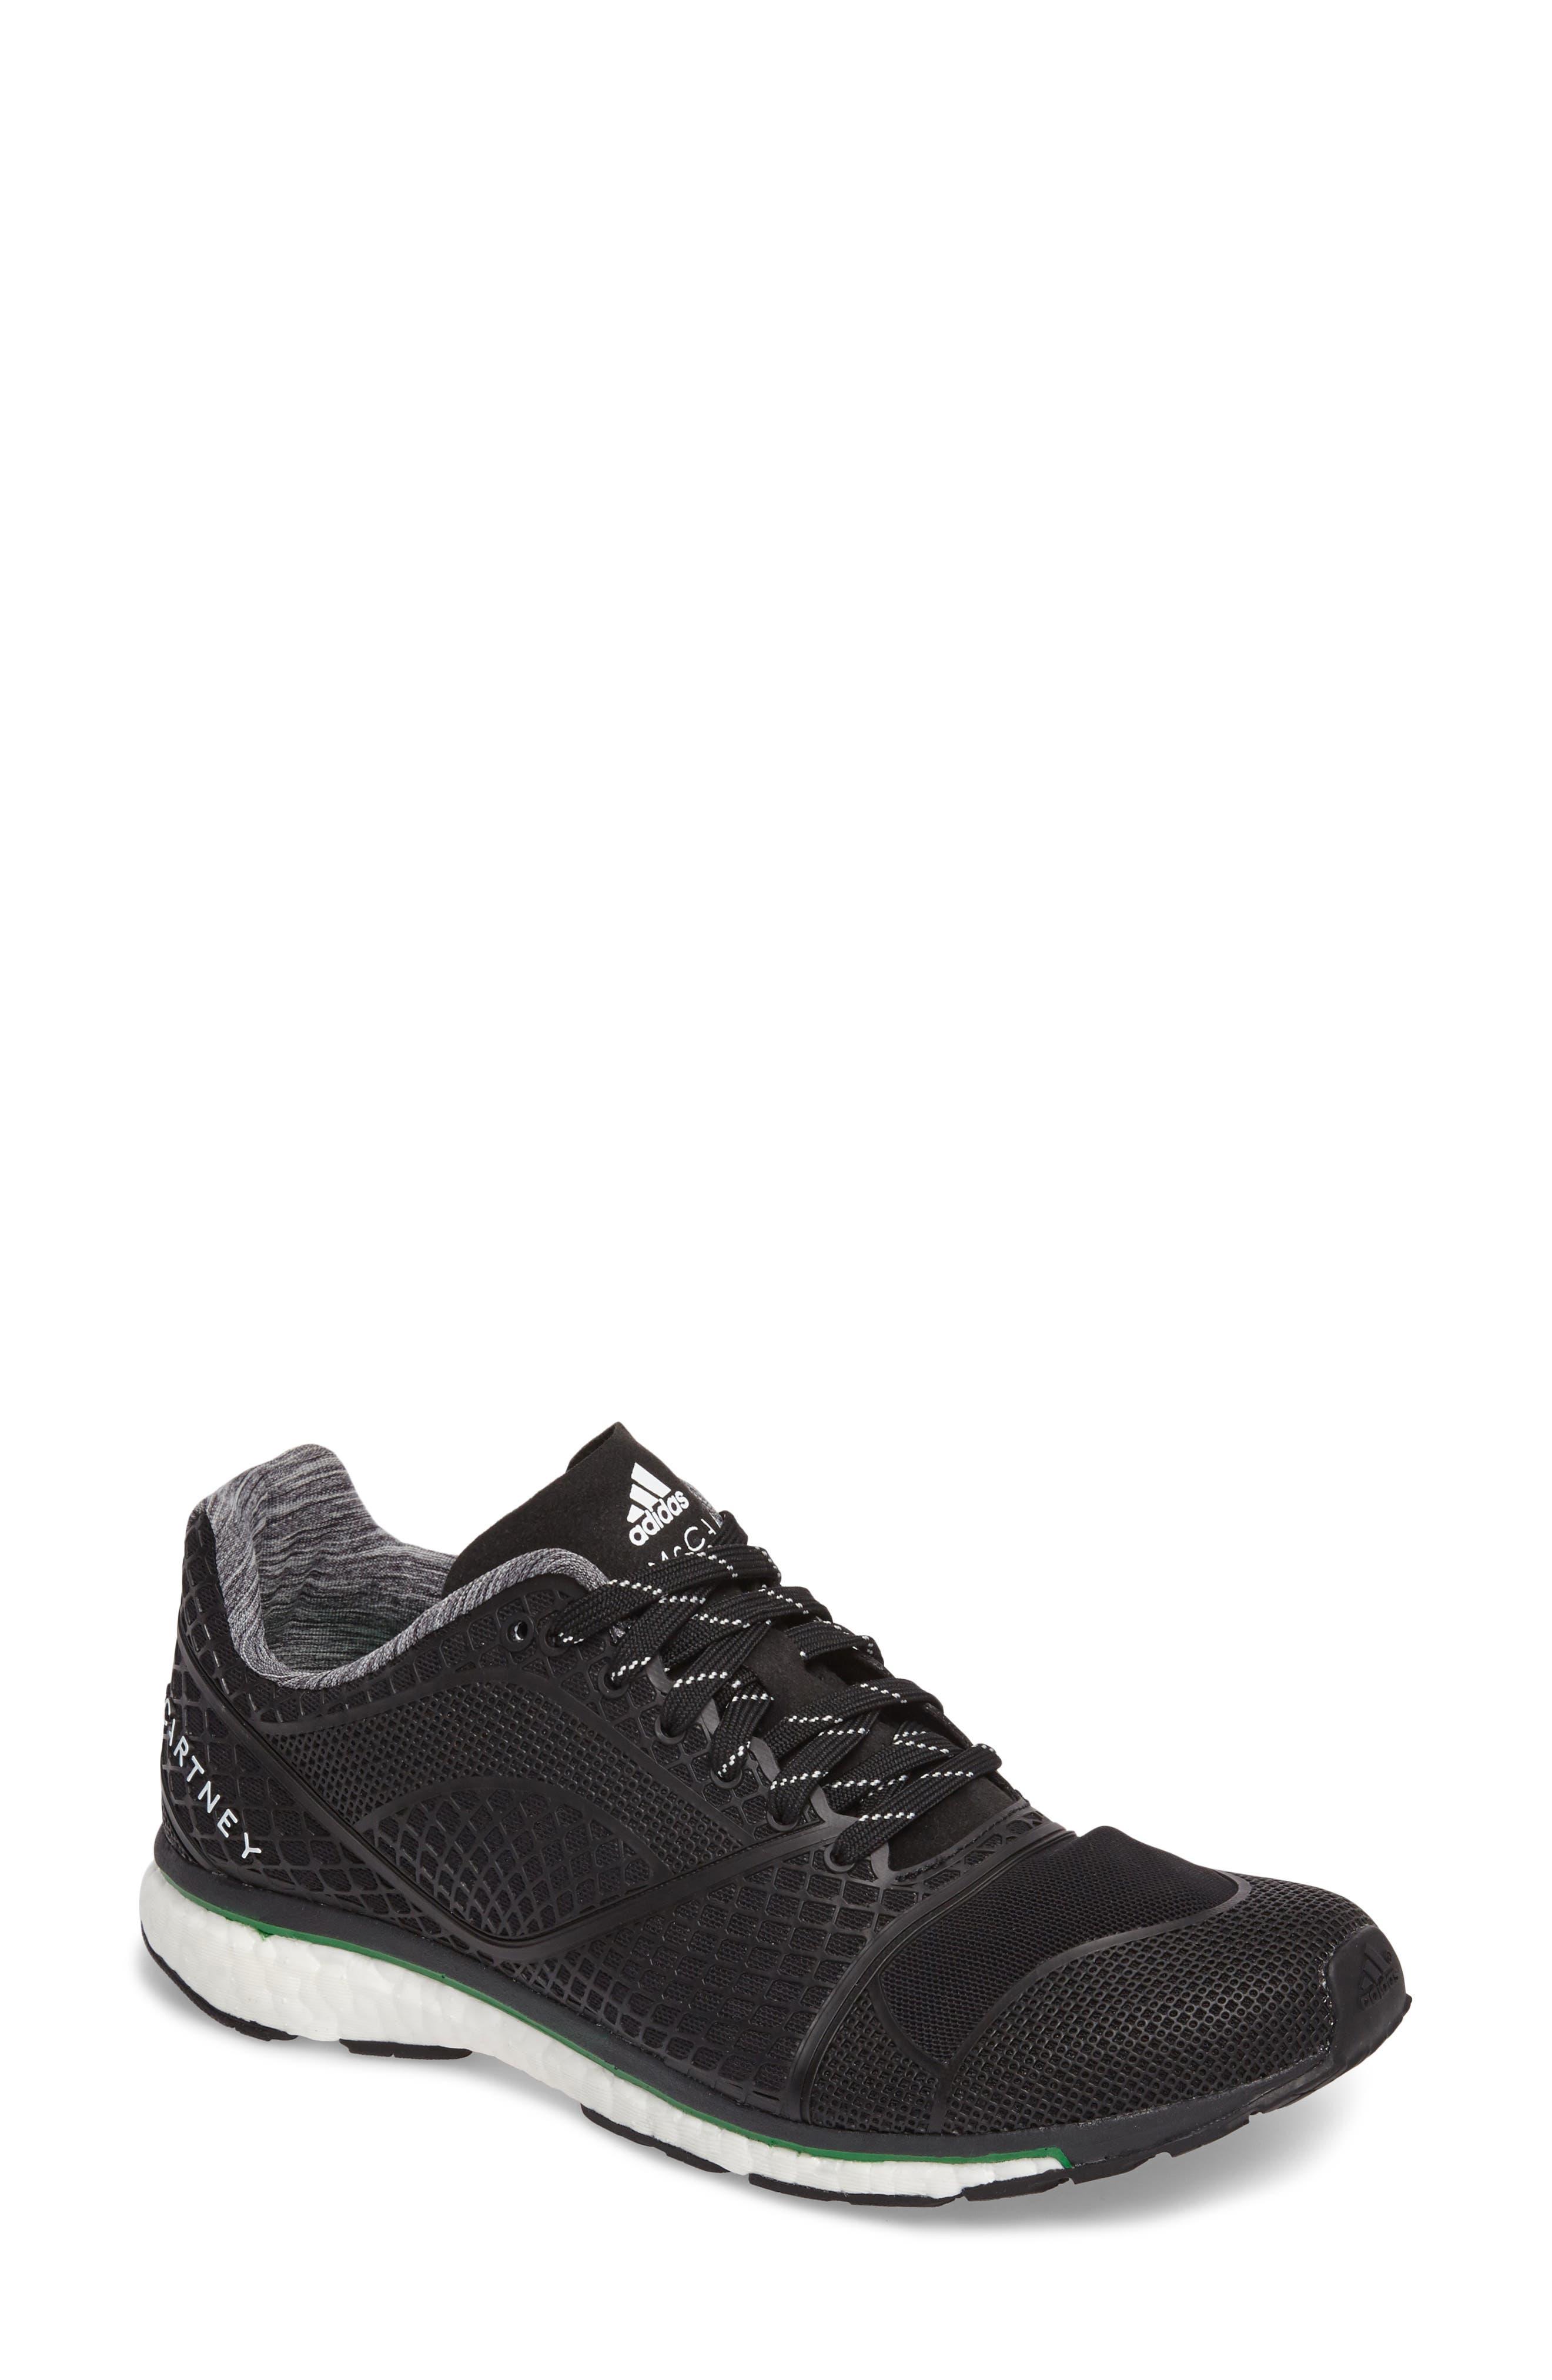 Main Image - adidas by Stella McCartney Adizero Adios Running Shoe (Women)